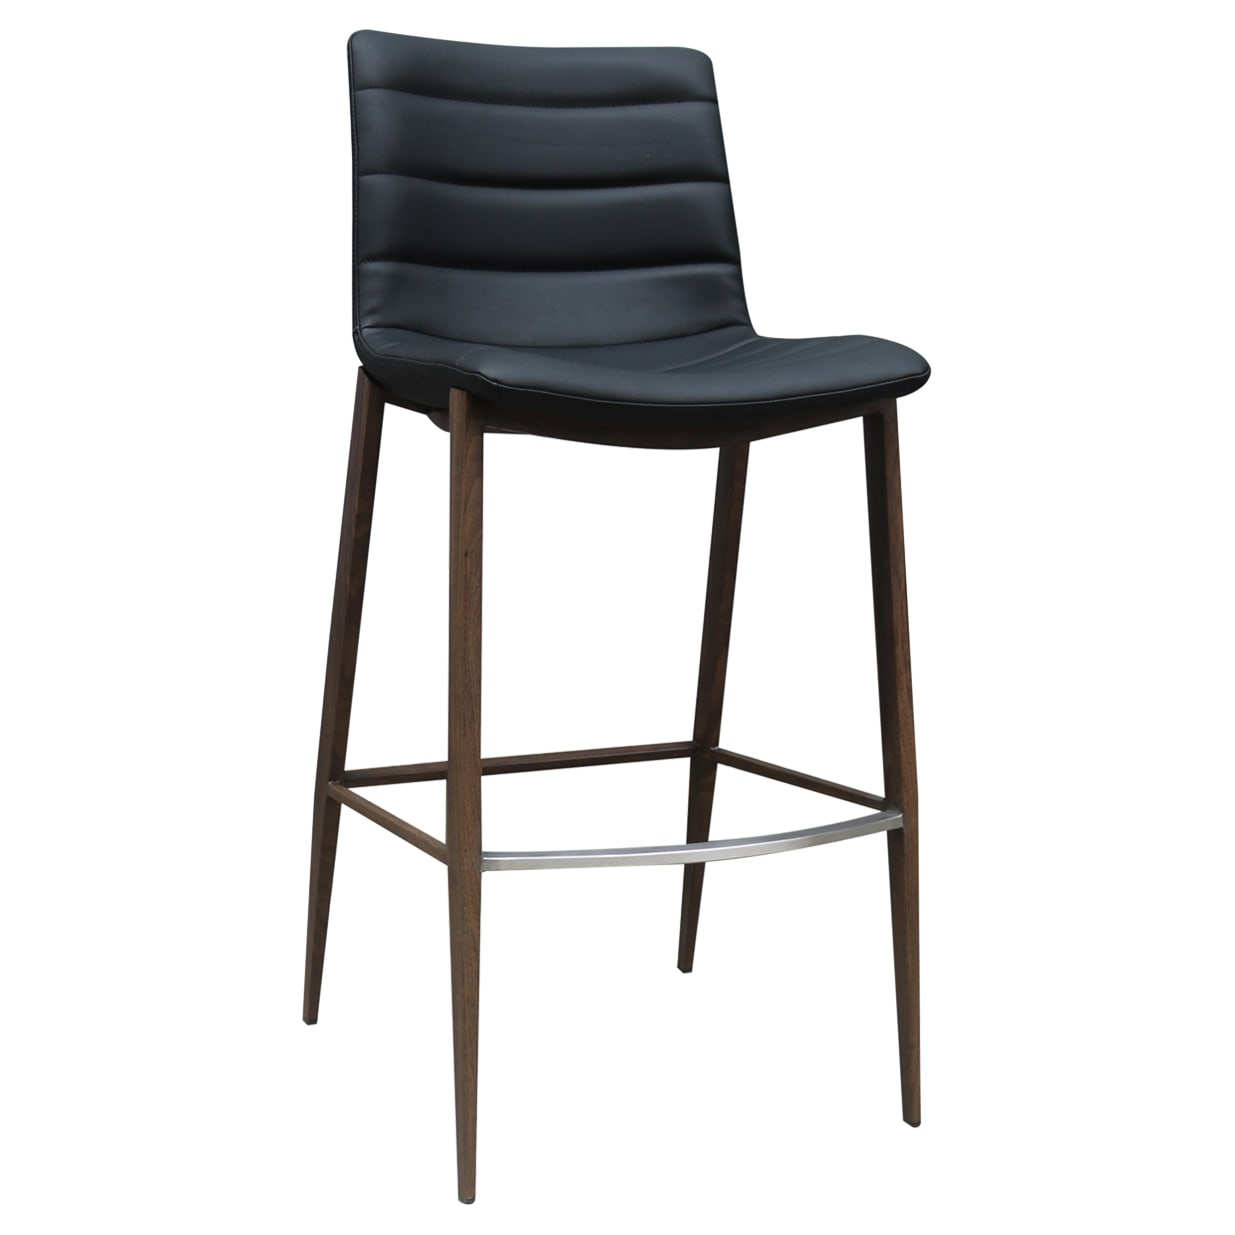 Galbassi Metal Club bar stool